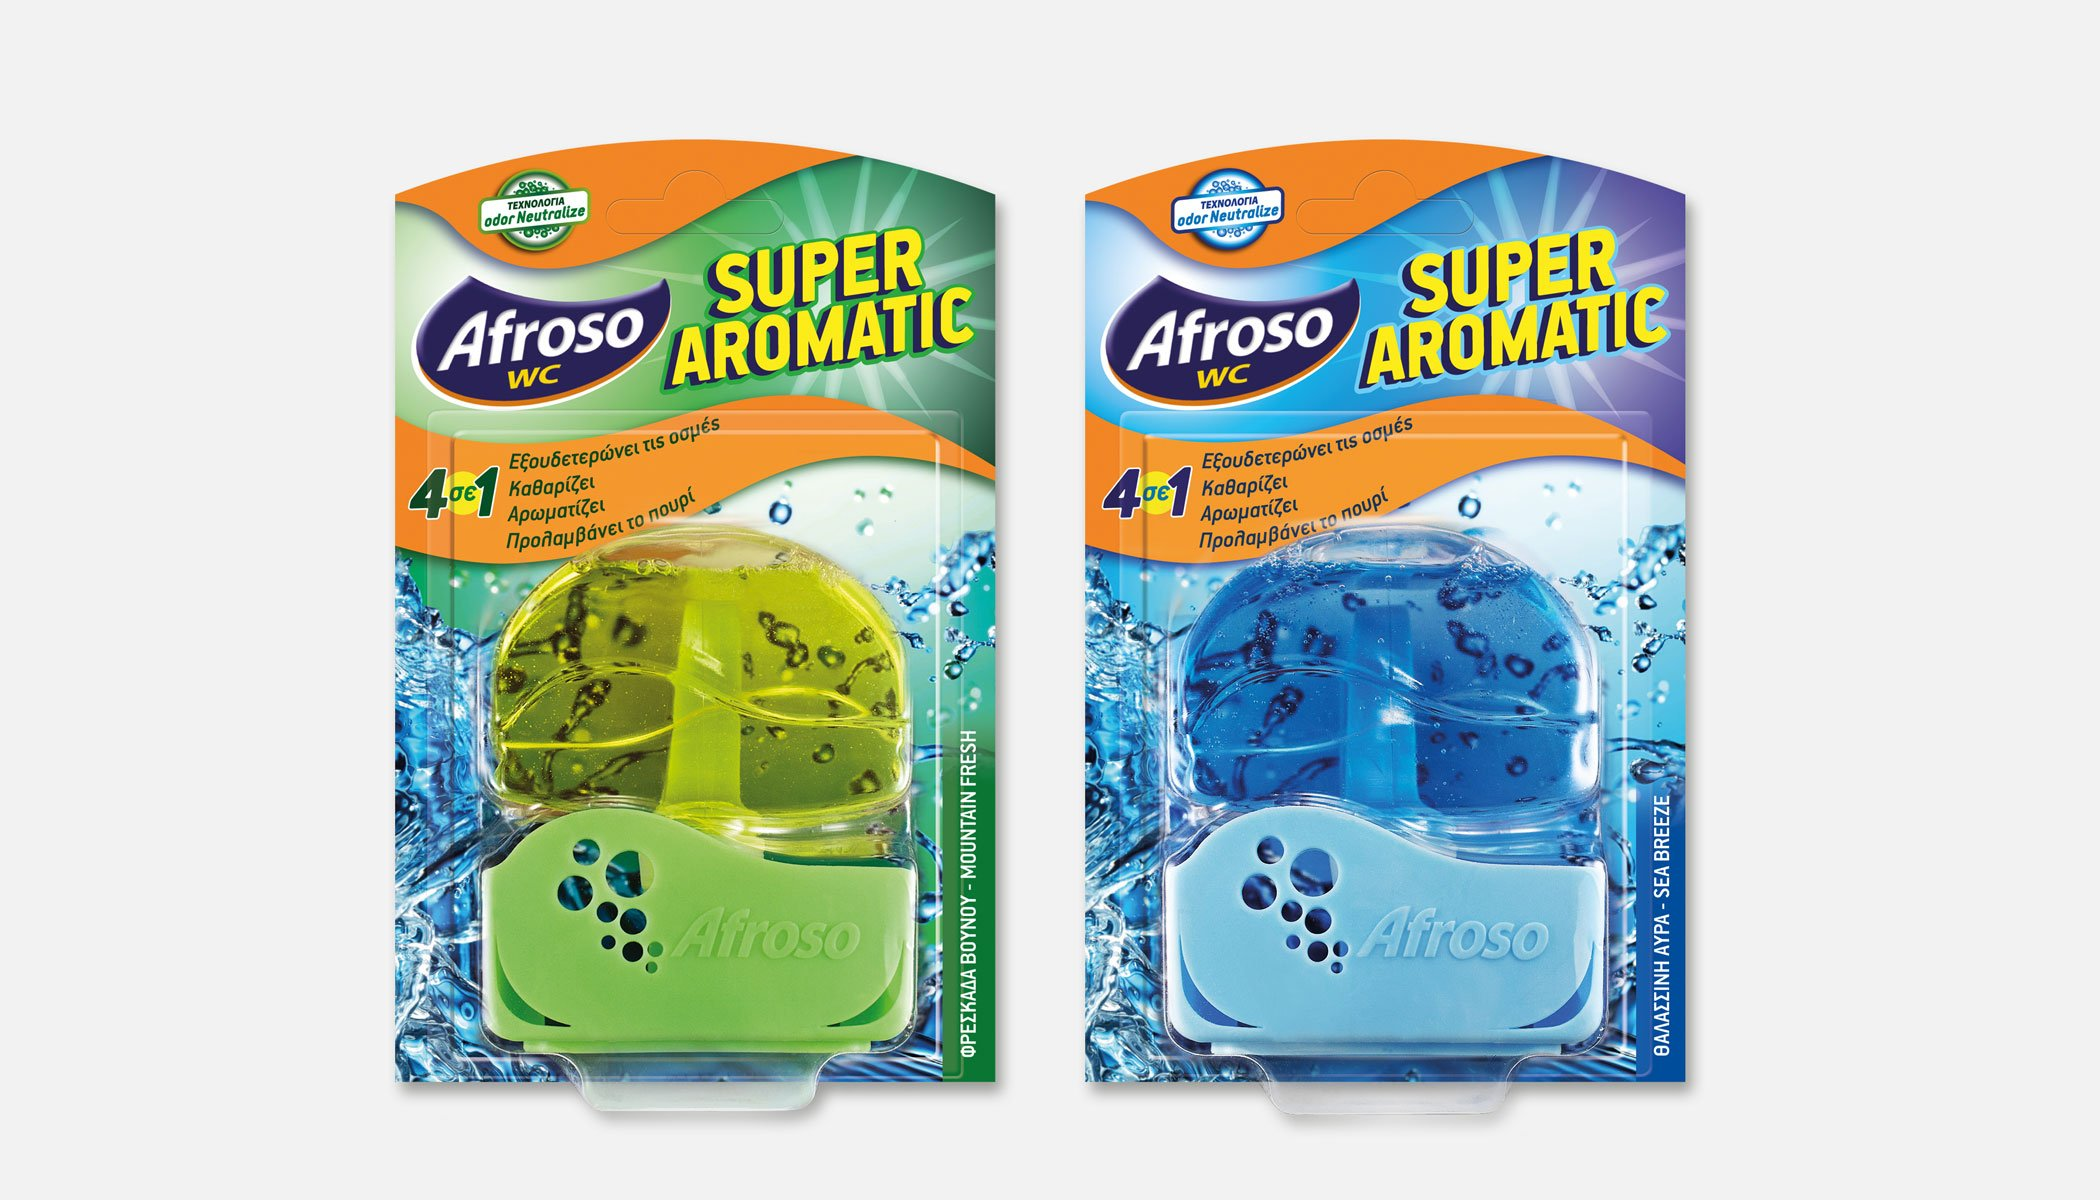 AFROSO Wc Block Aromatic